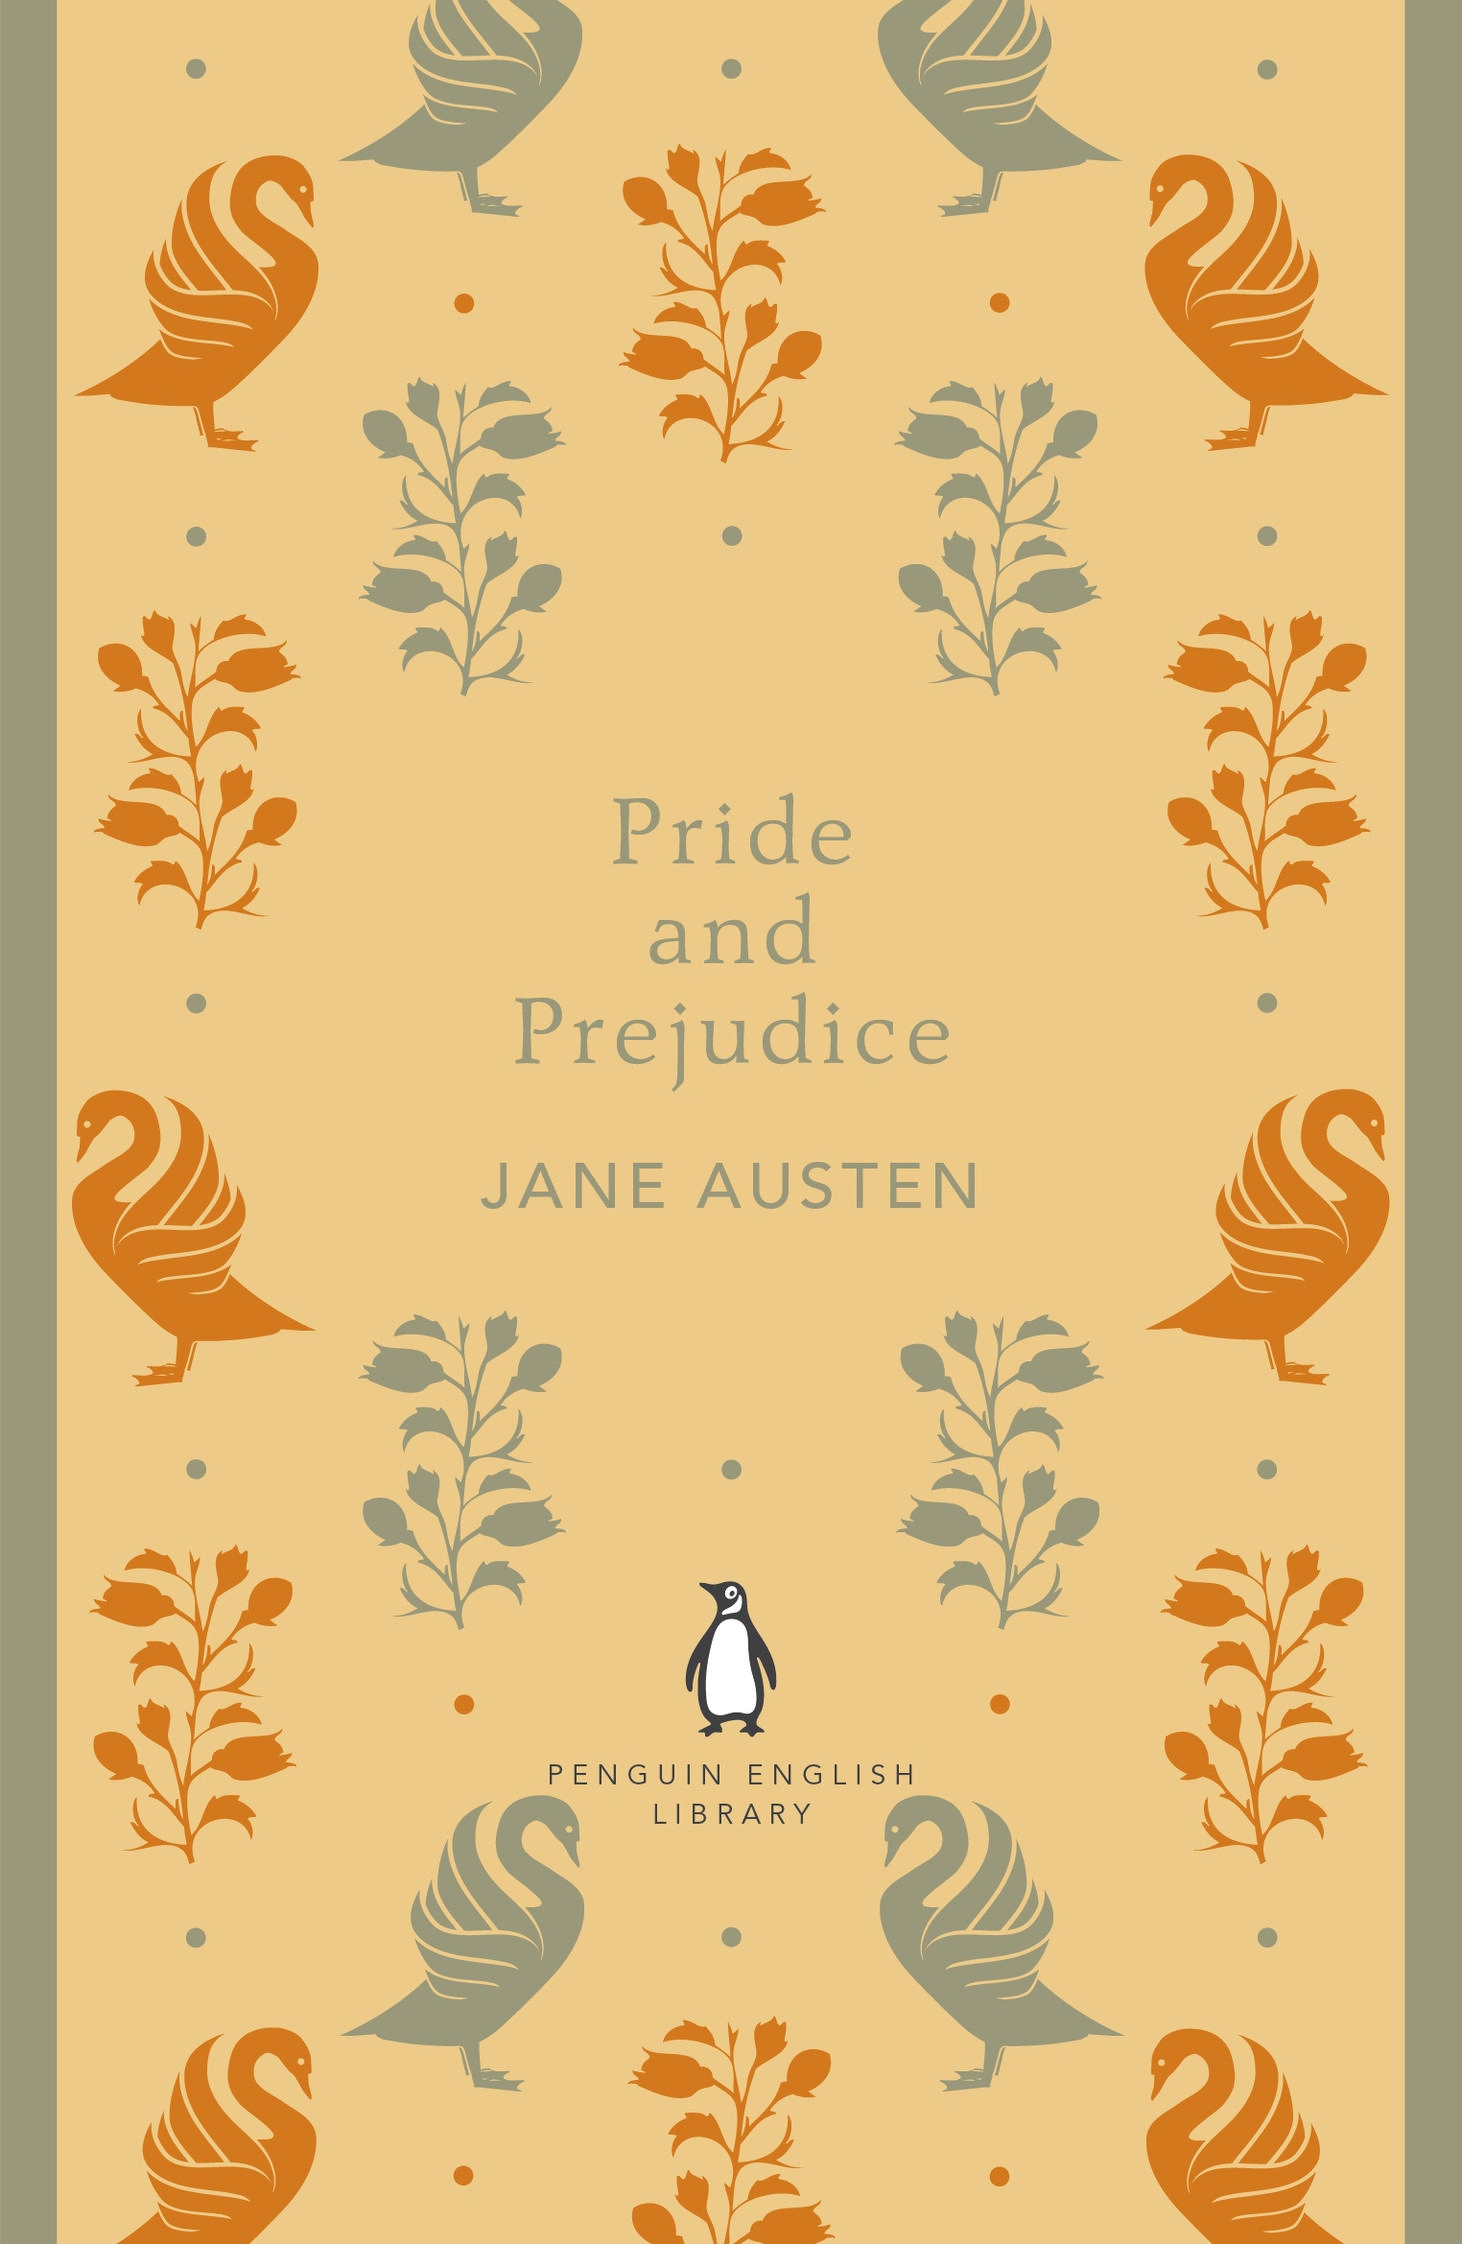 pride and prejudice paper